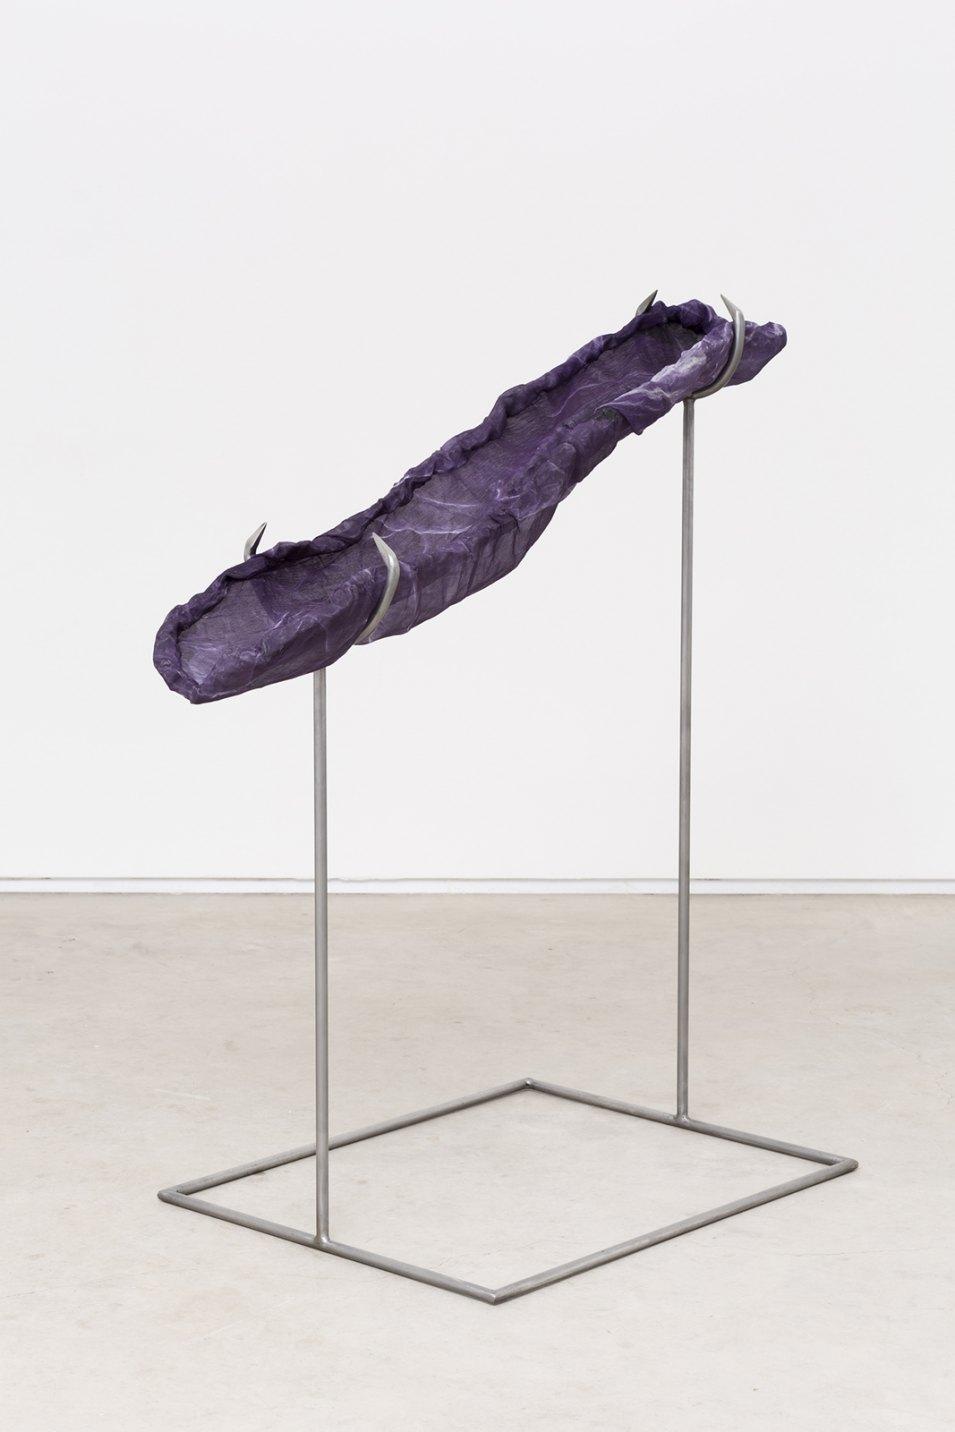 Felipe Meres, <em>Weave Weavers Weave</em>, 2017, electron micrograph, pigment print on silk, woven aluminum, polished steel, 119 × 61 × 114 cm - Mendes Wood DM